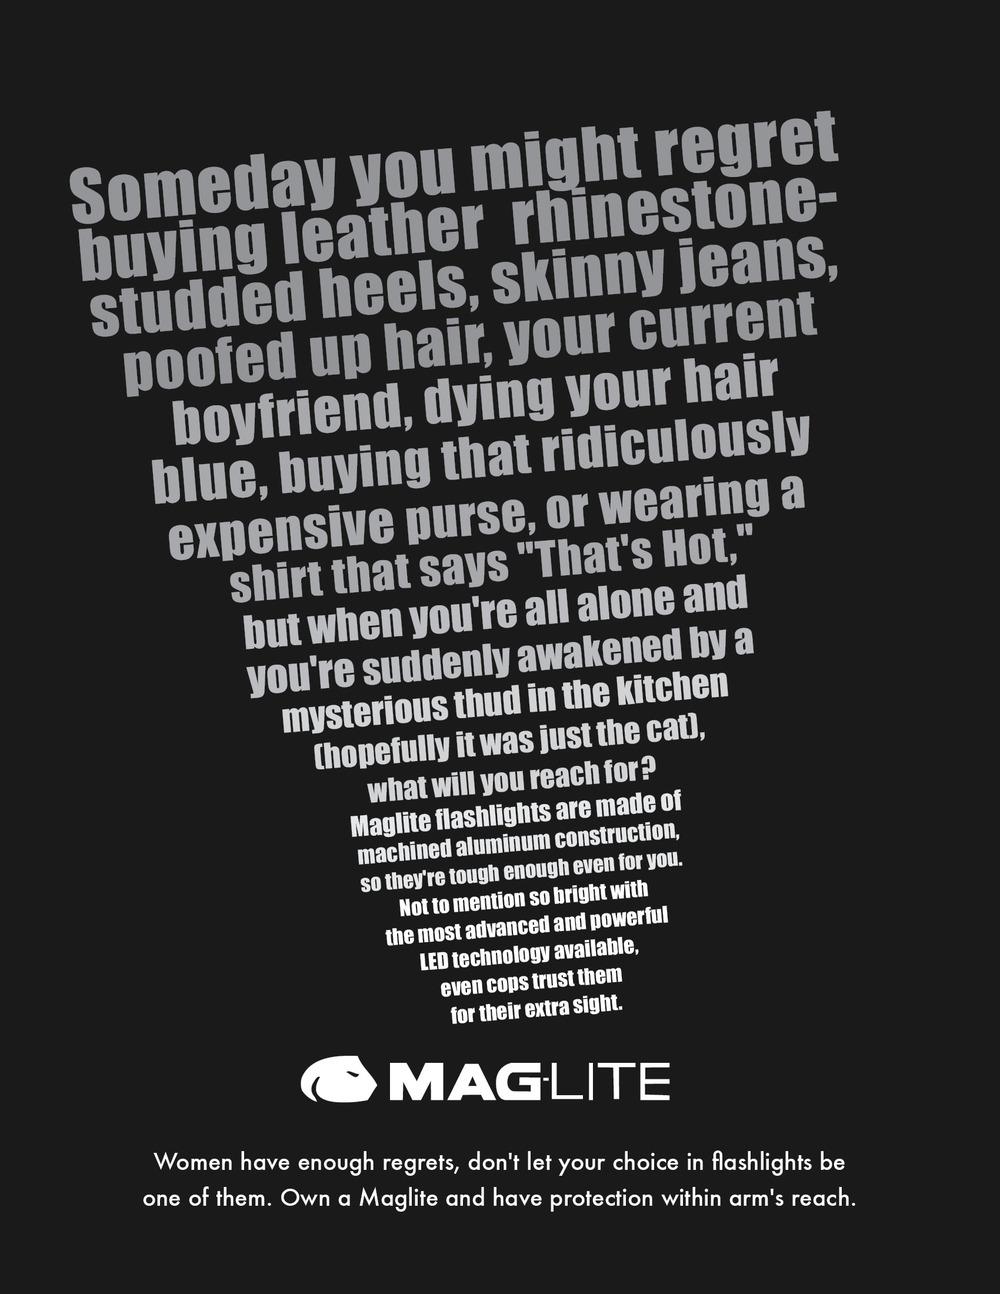 Maglite_Ad1_v3.jpg